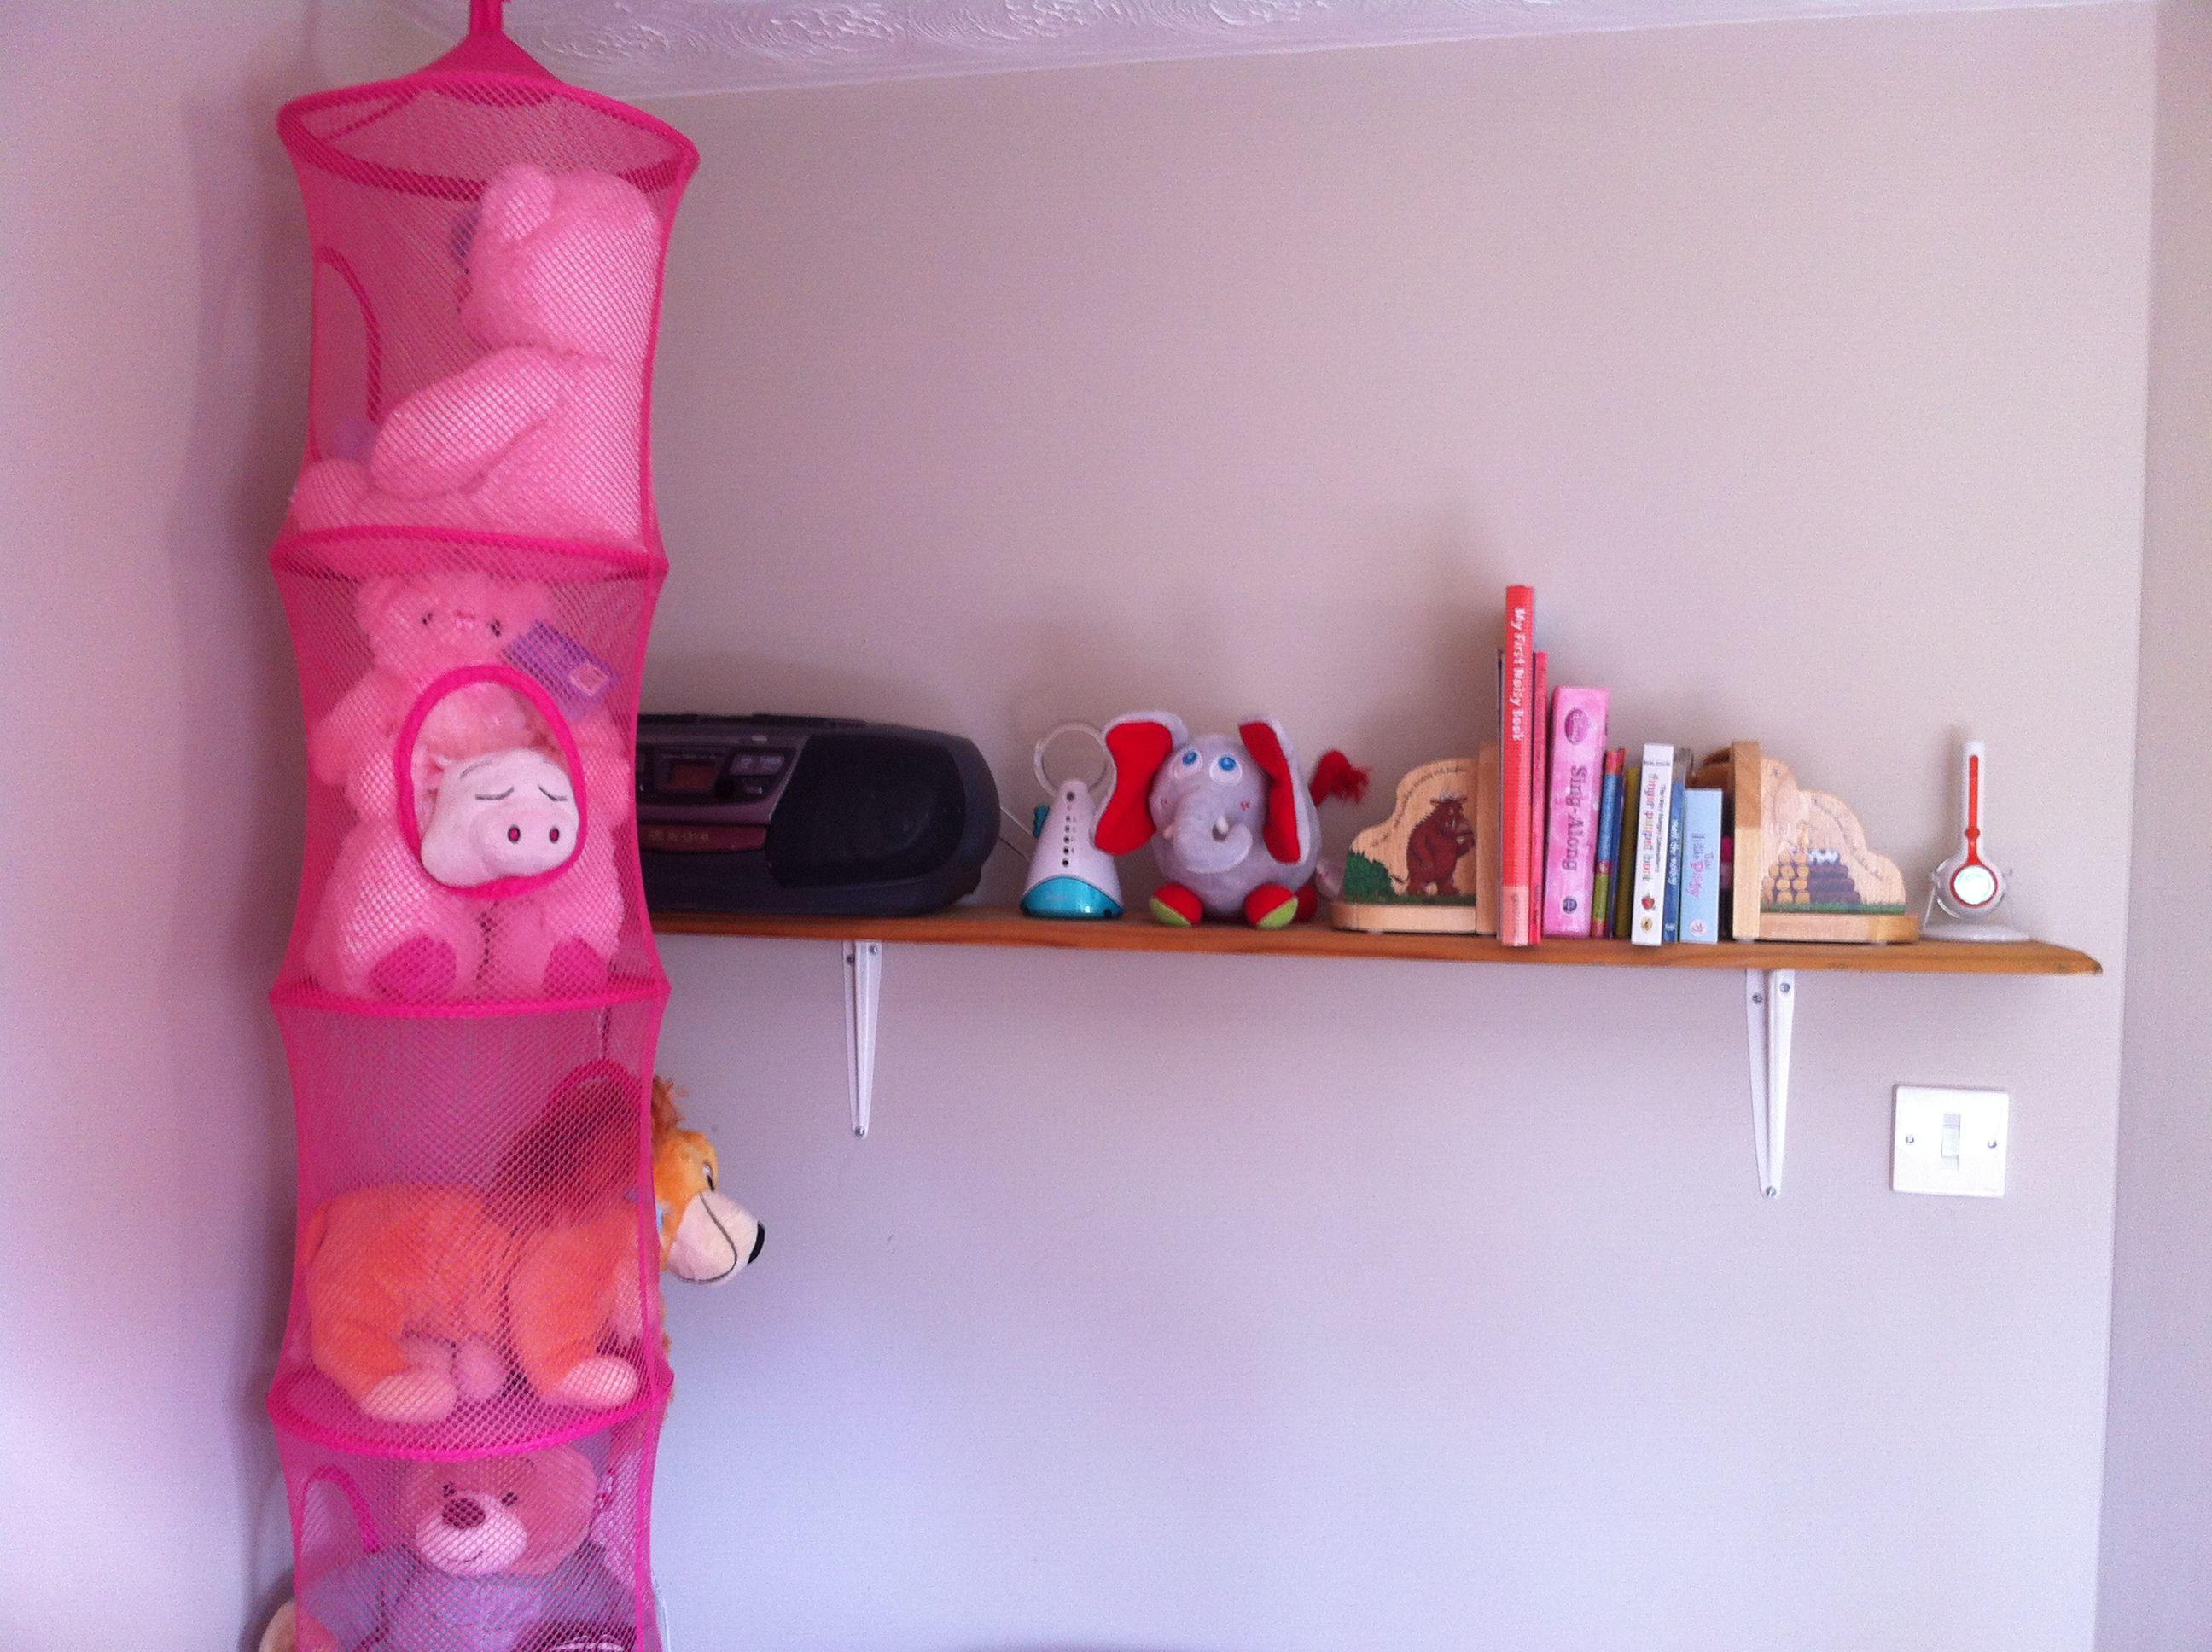 Cuddly toy storage net and bookshelf